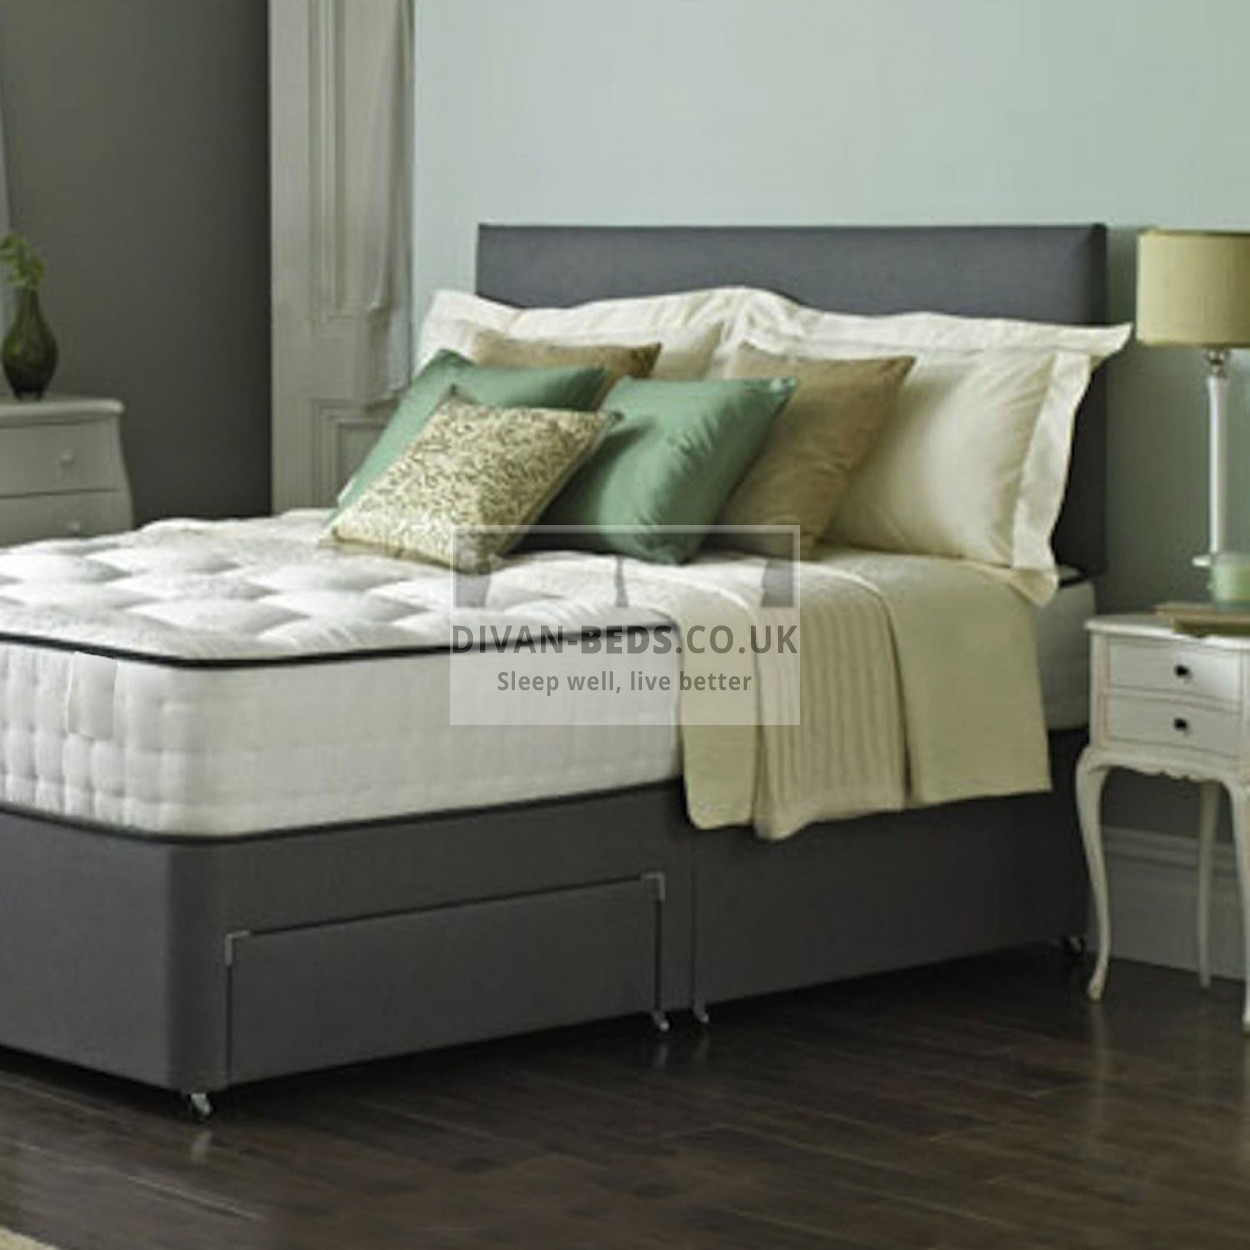 Royal Memory Divan Bed Set With High Density Open Spring